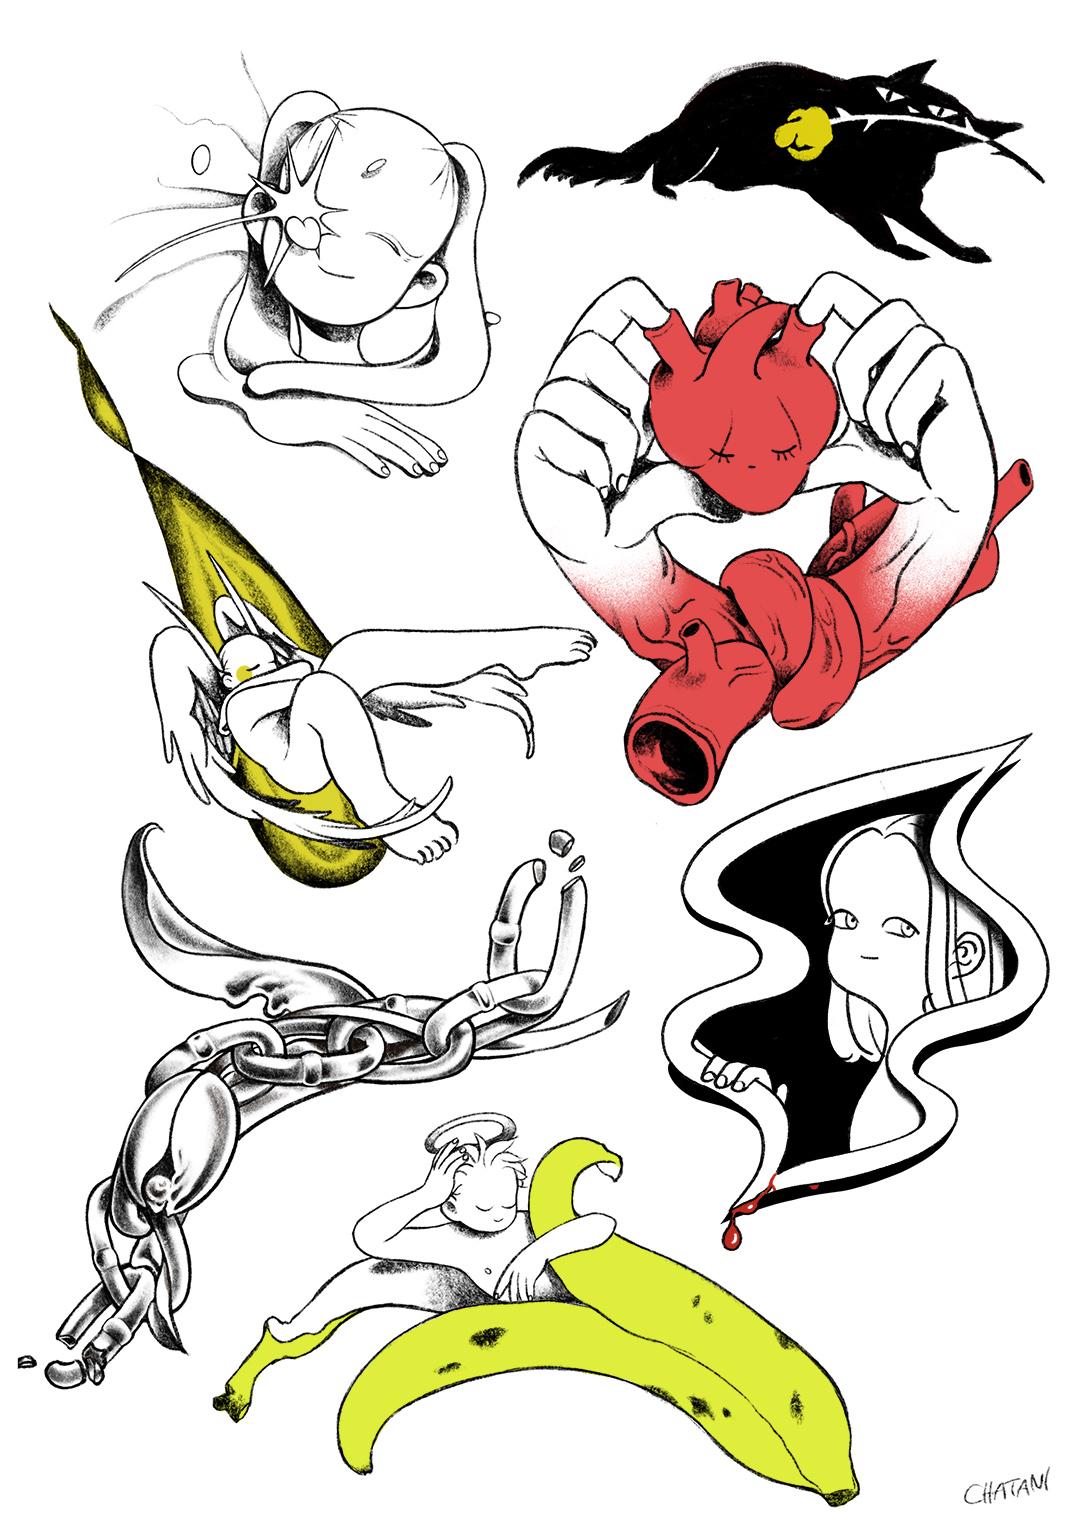 GirlsclubAsia-Artist-Hana Chatani-image 08